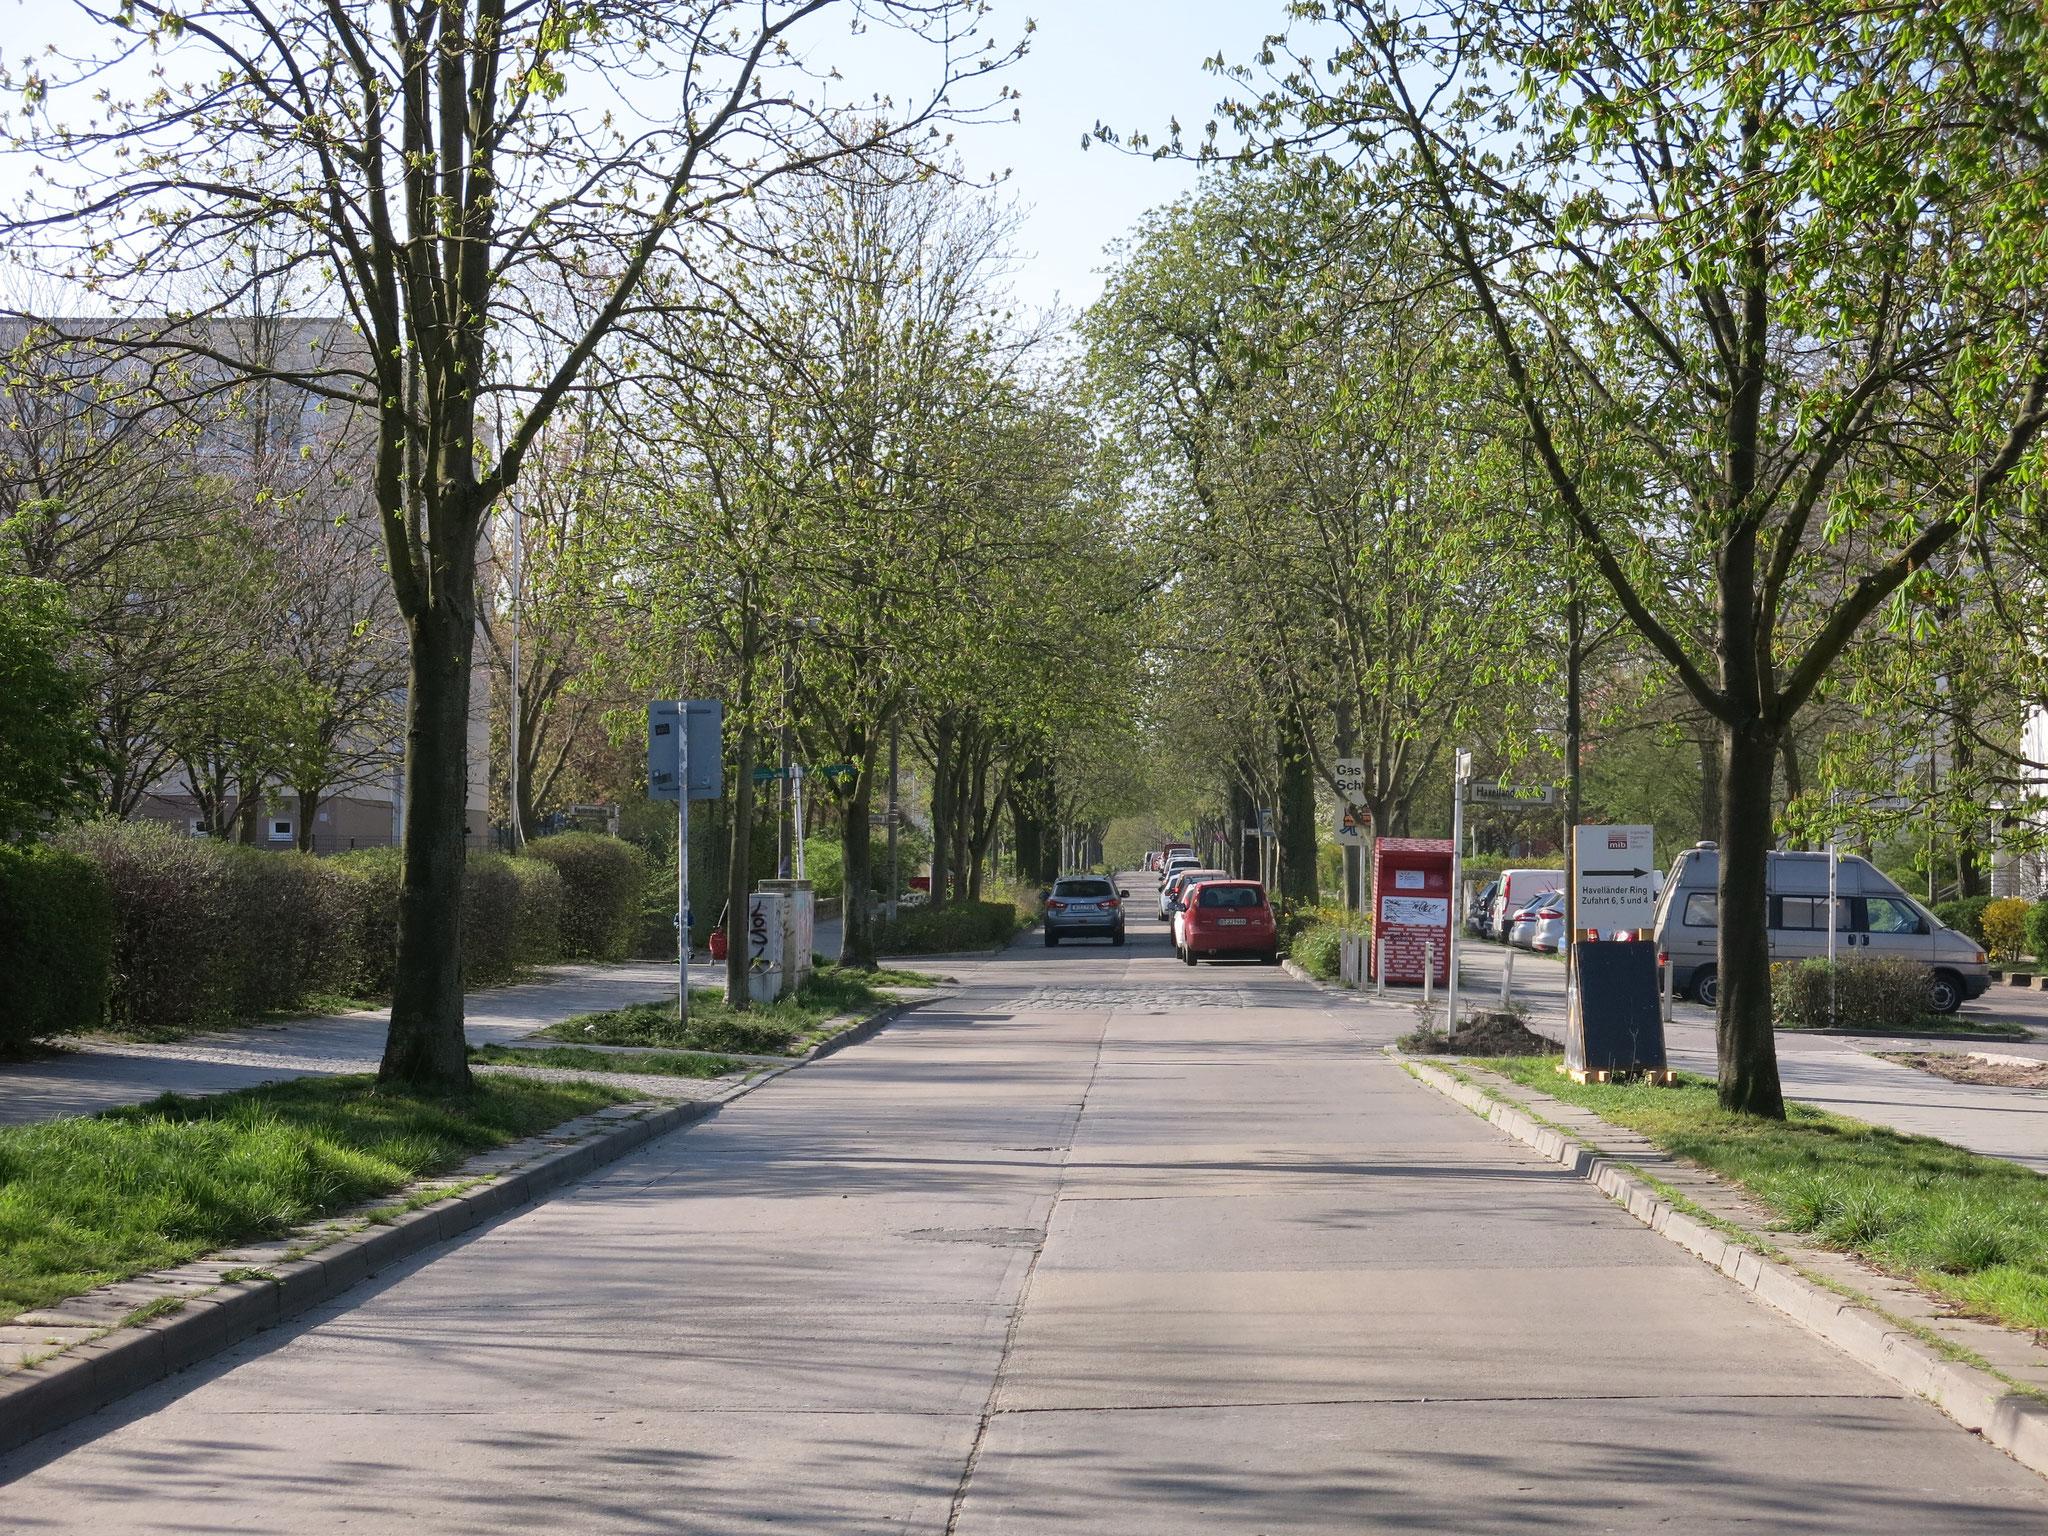 Tipp 3: Wuhle-Hönow-Weg, Kastanienallee